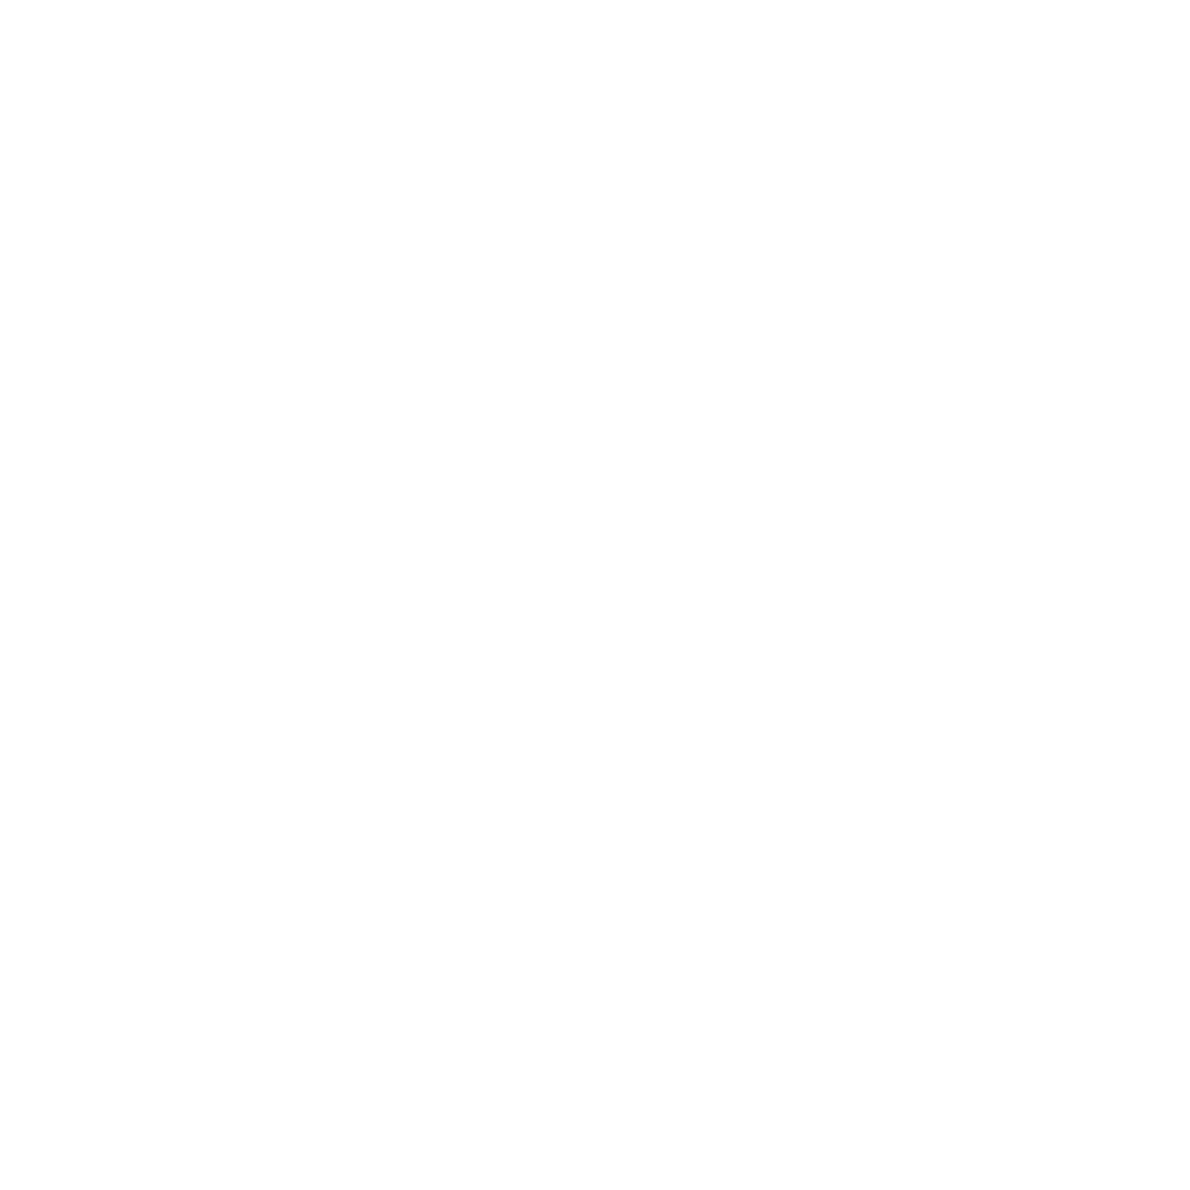 karaoke-icon.png